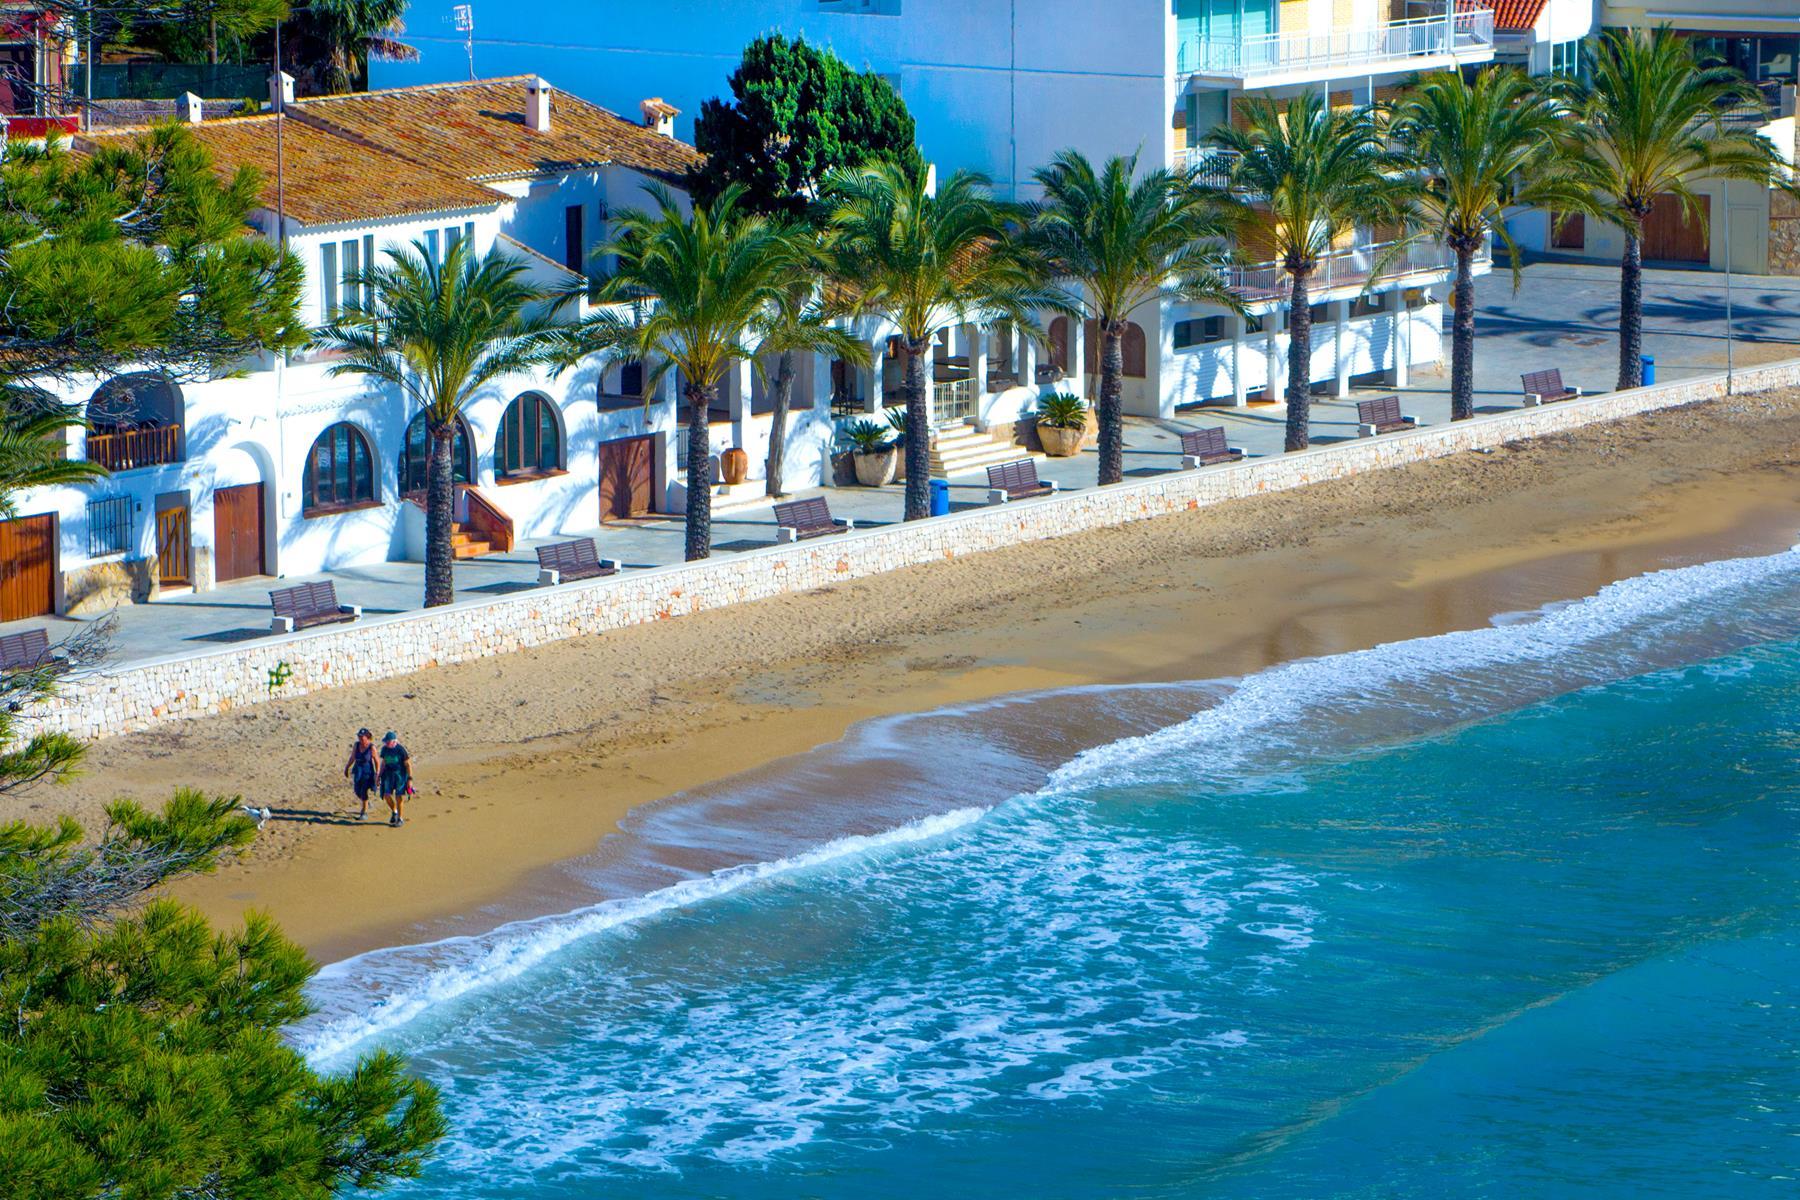 The sandy beach of El Portet, Moraira, Costa Blanca, Spain